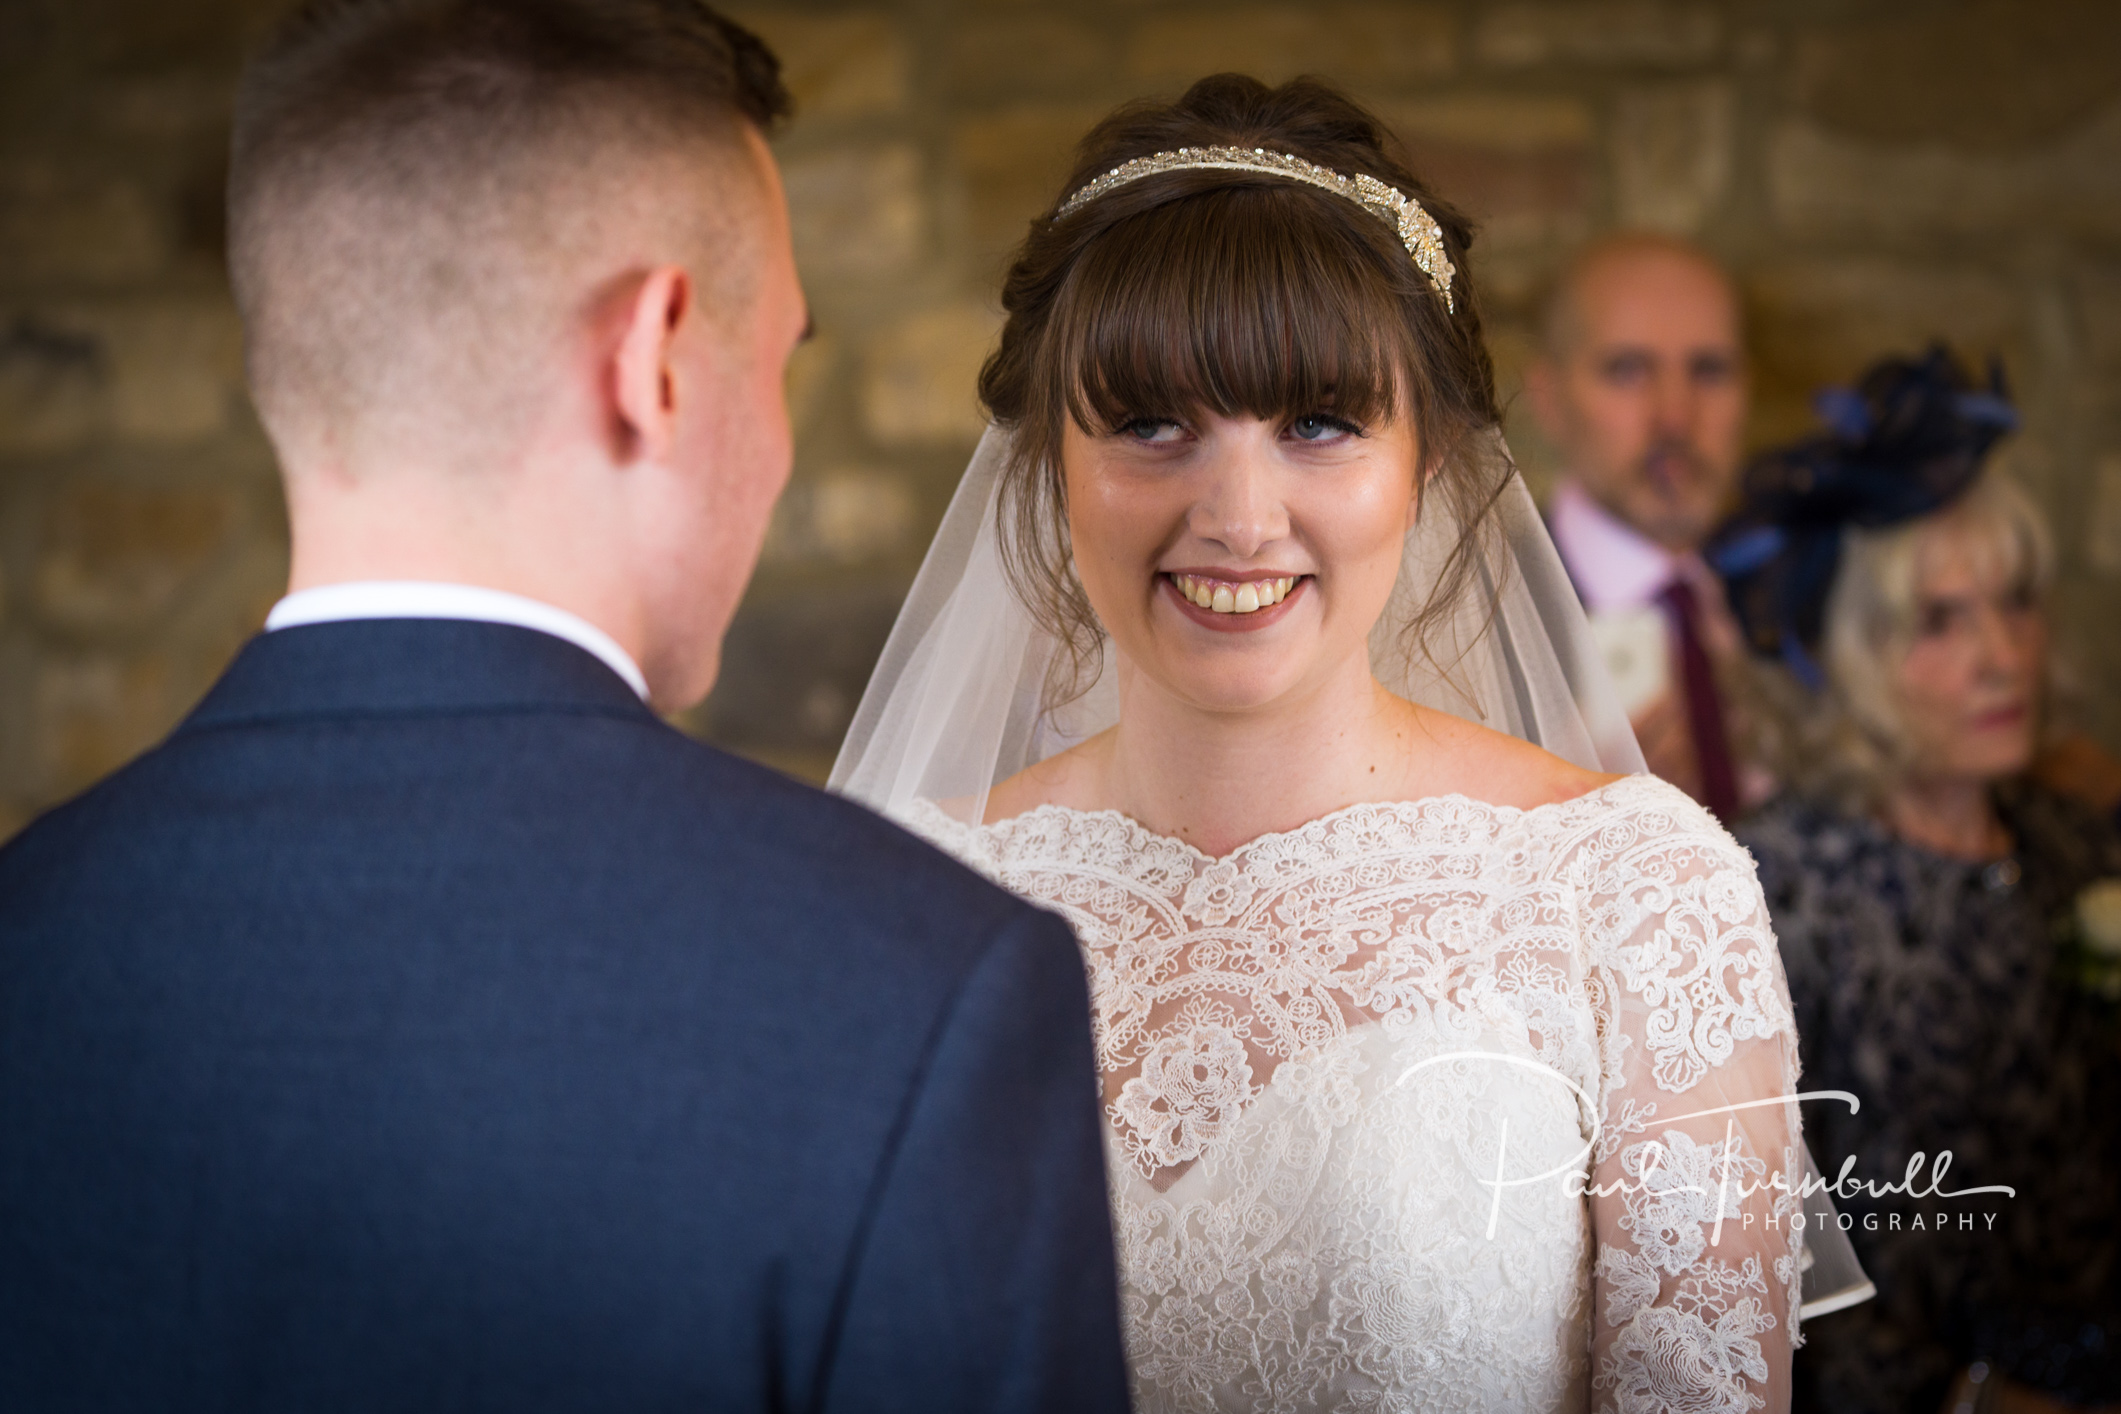 wedding-photographer-raven-hall-ravenscroft--scarborough-yorkshire-lucy-ryan-045.jpg